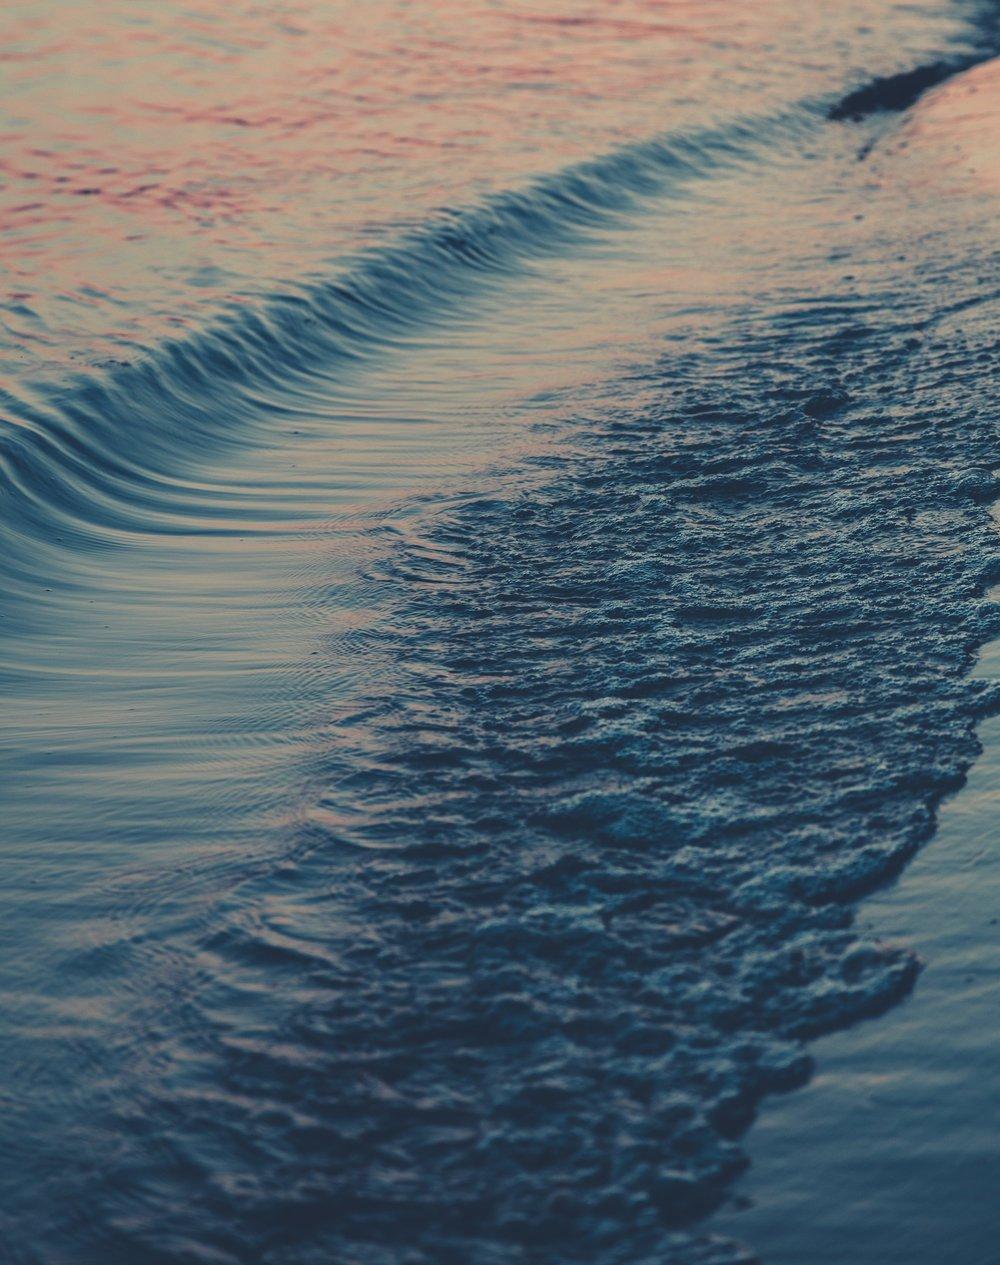 android-wallpaper-beach-free-wallpaper-1322093.jpg